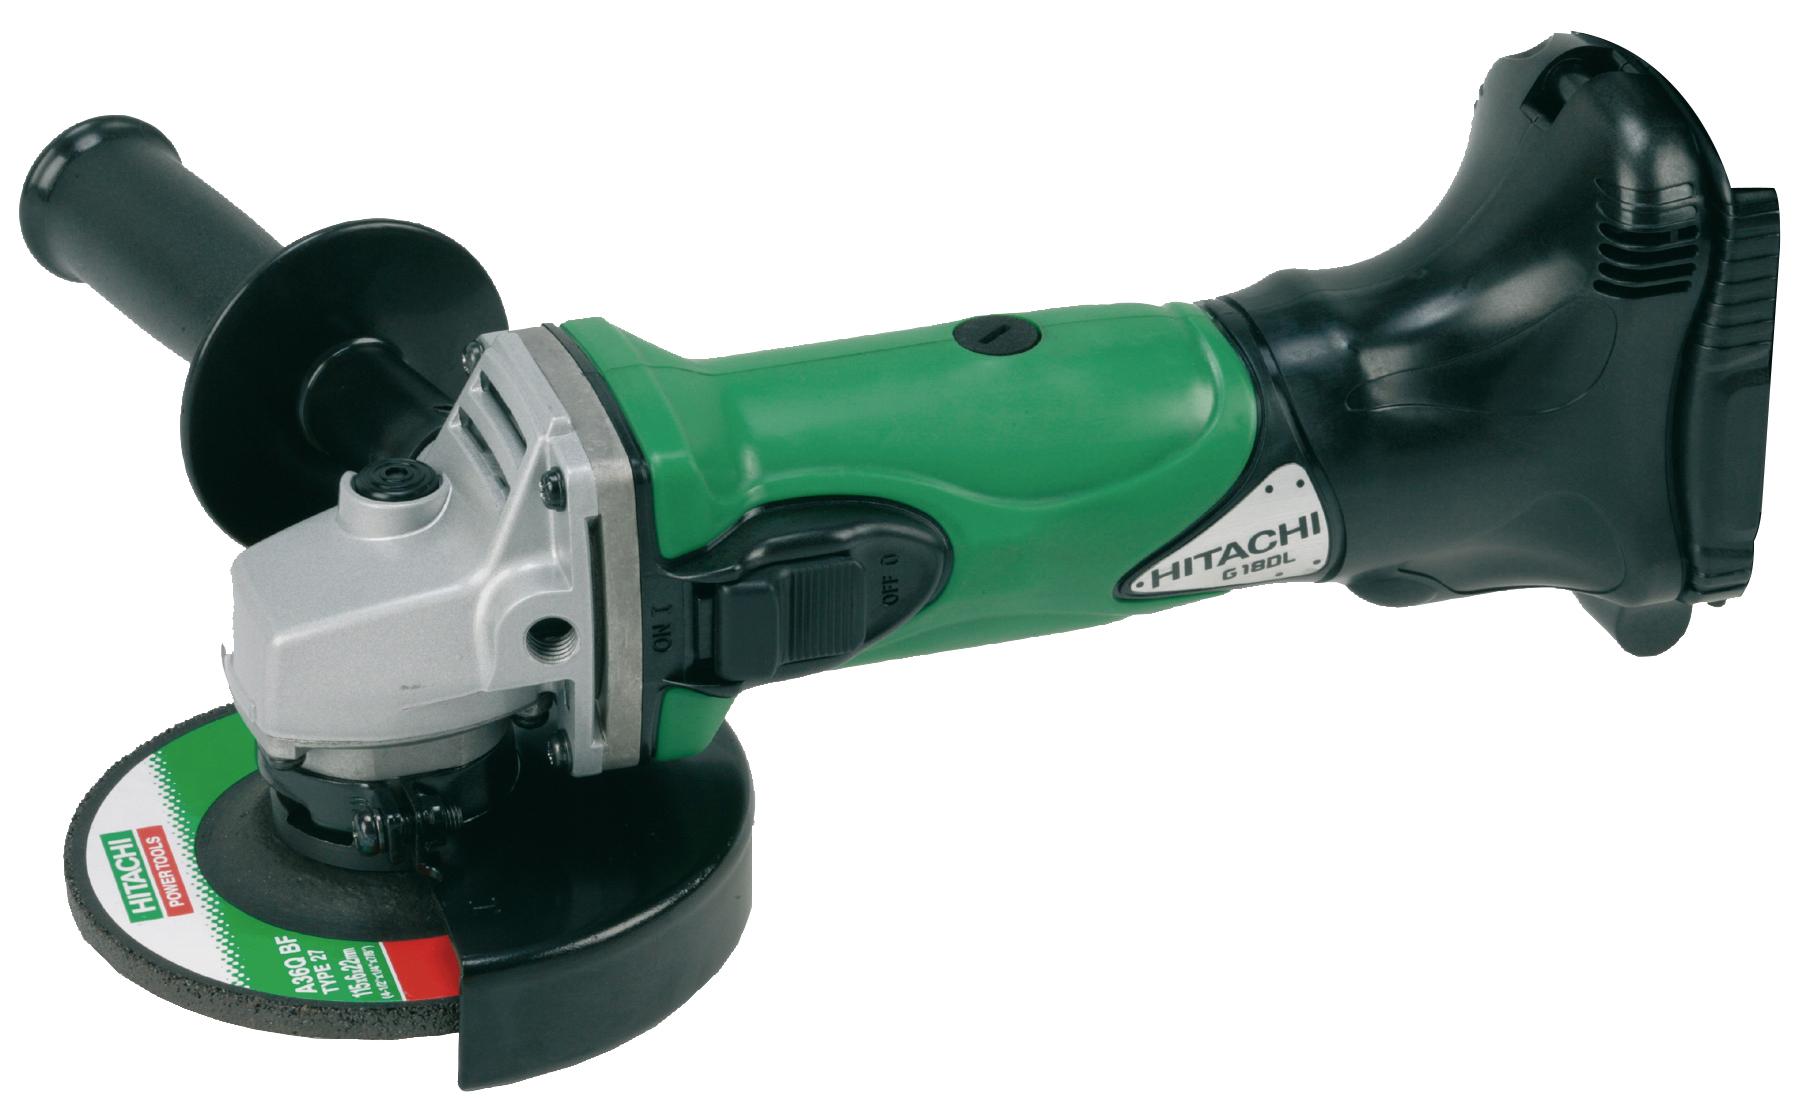 G18DLW4-Minia-Grinder-115-mm-18-V-battery-pressure-without-batteries